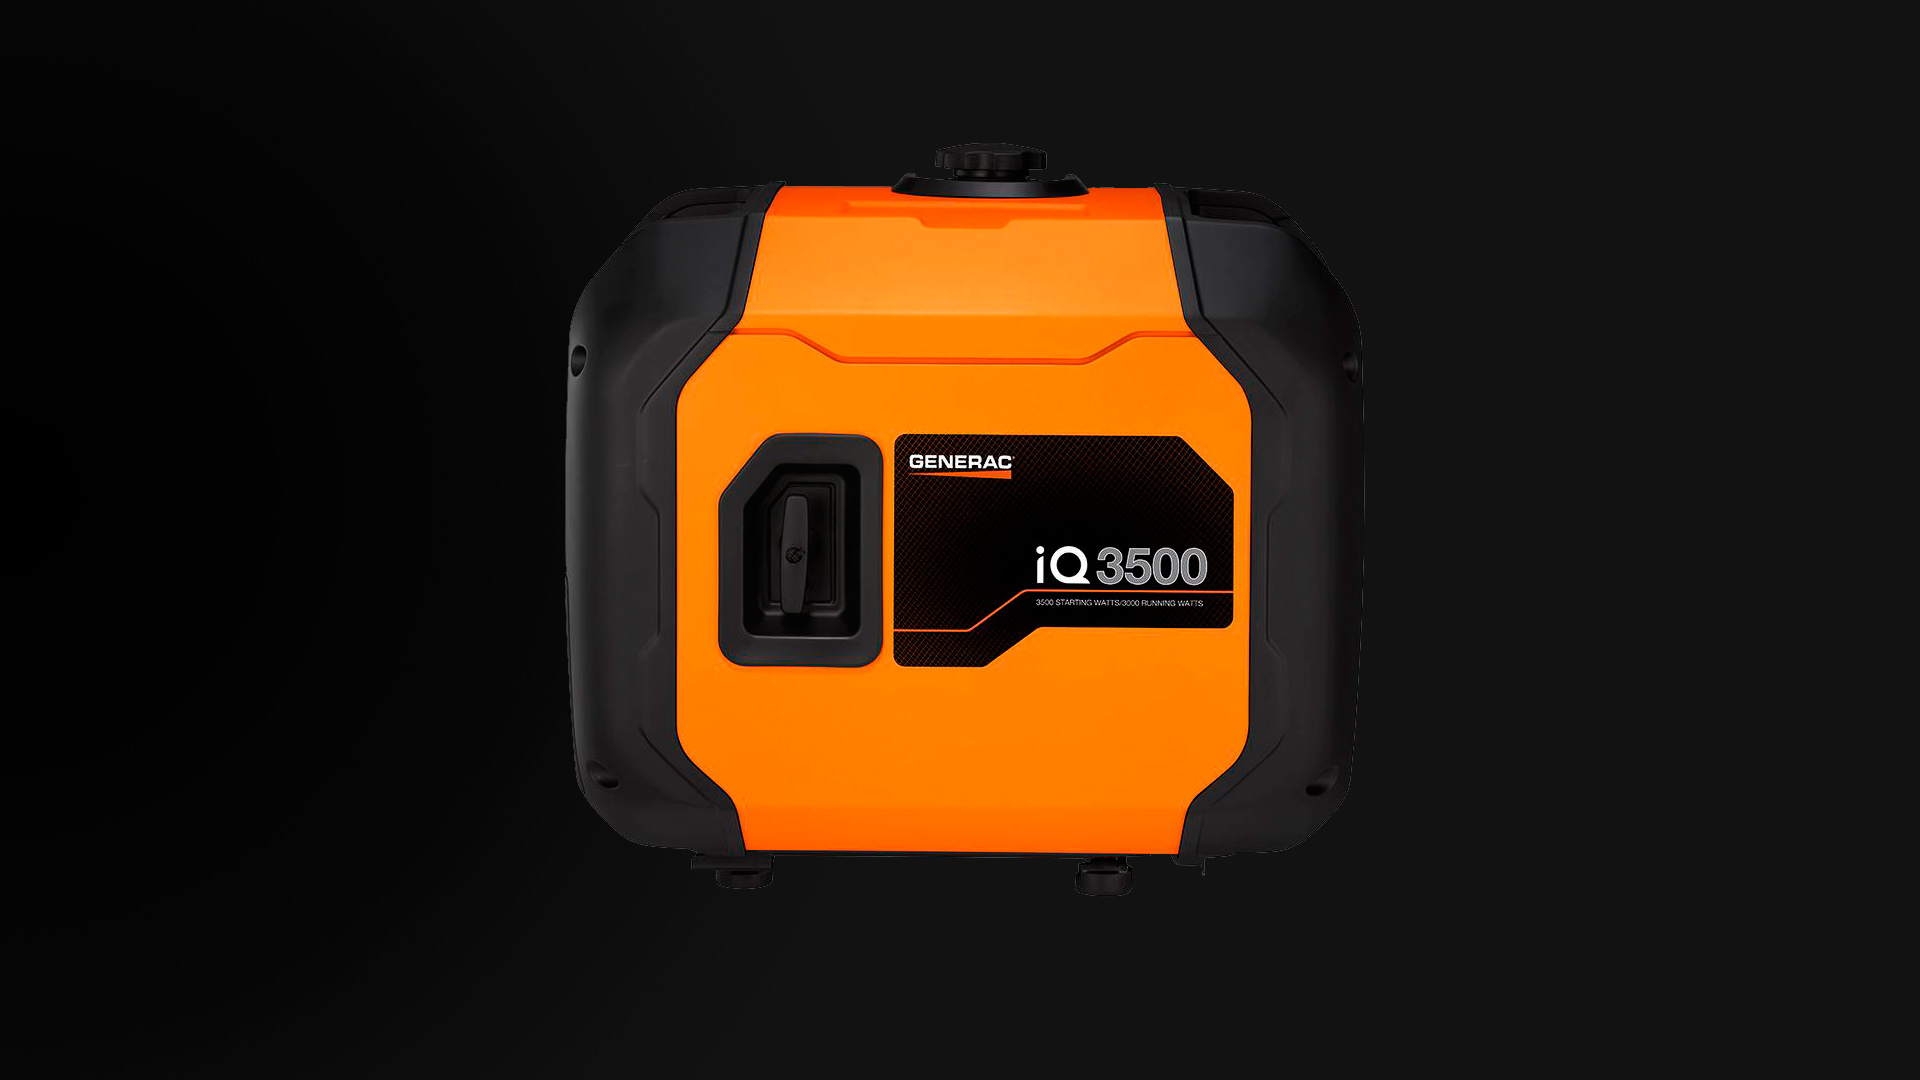 Generac iQ3500 Generator Side